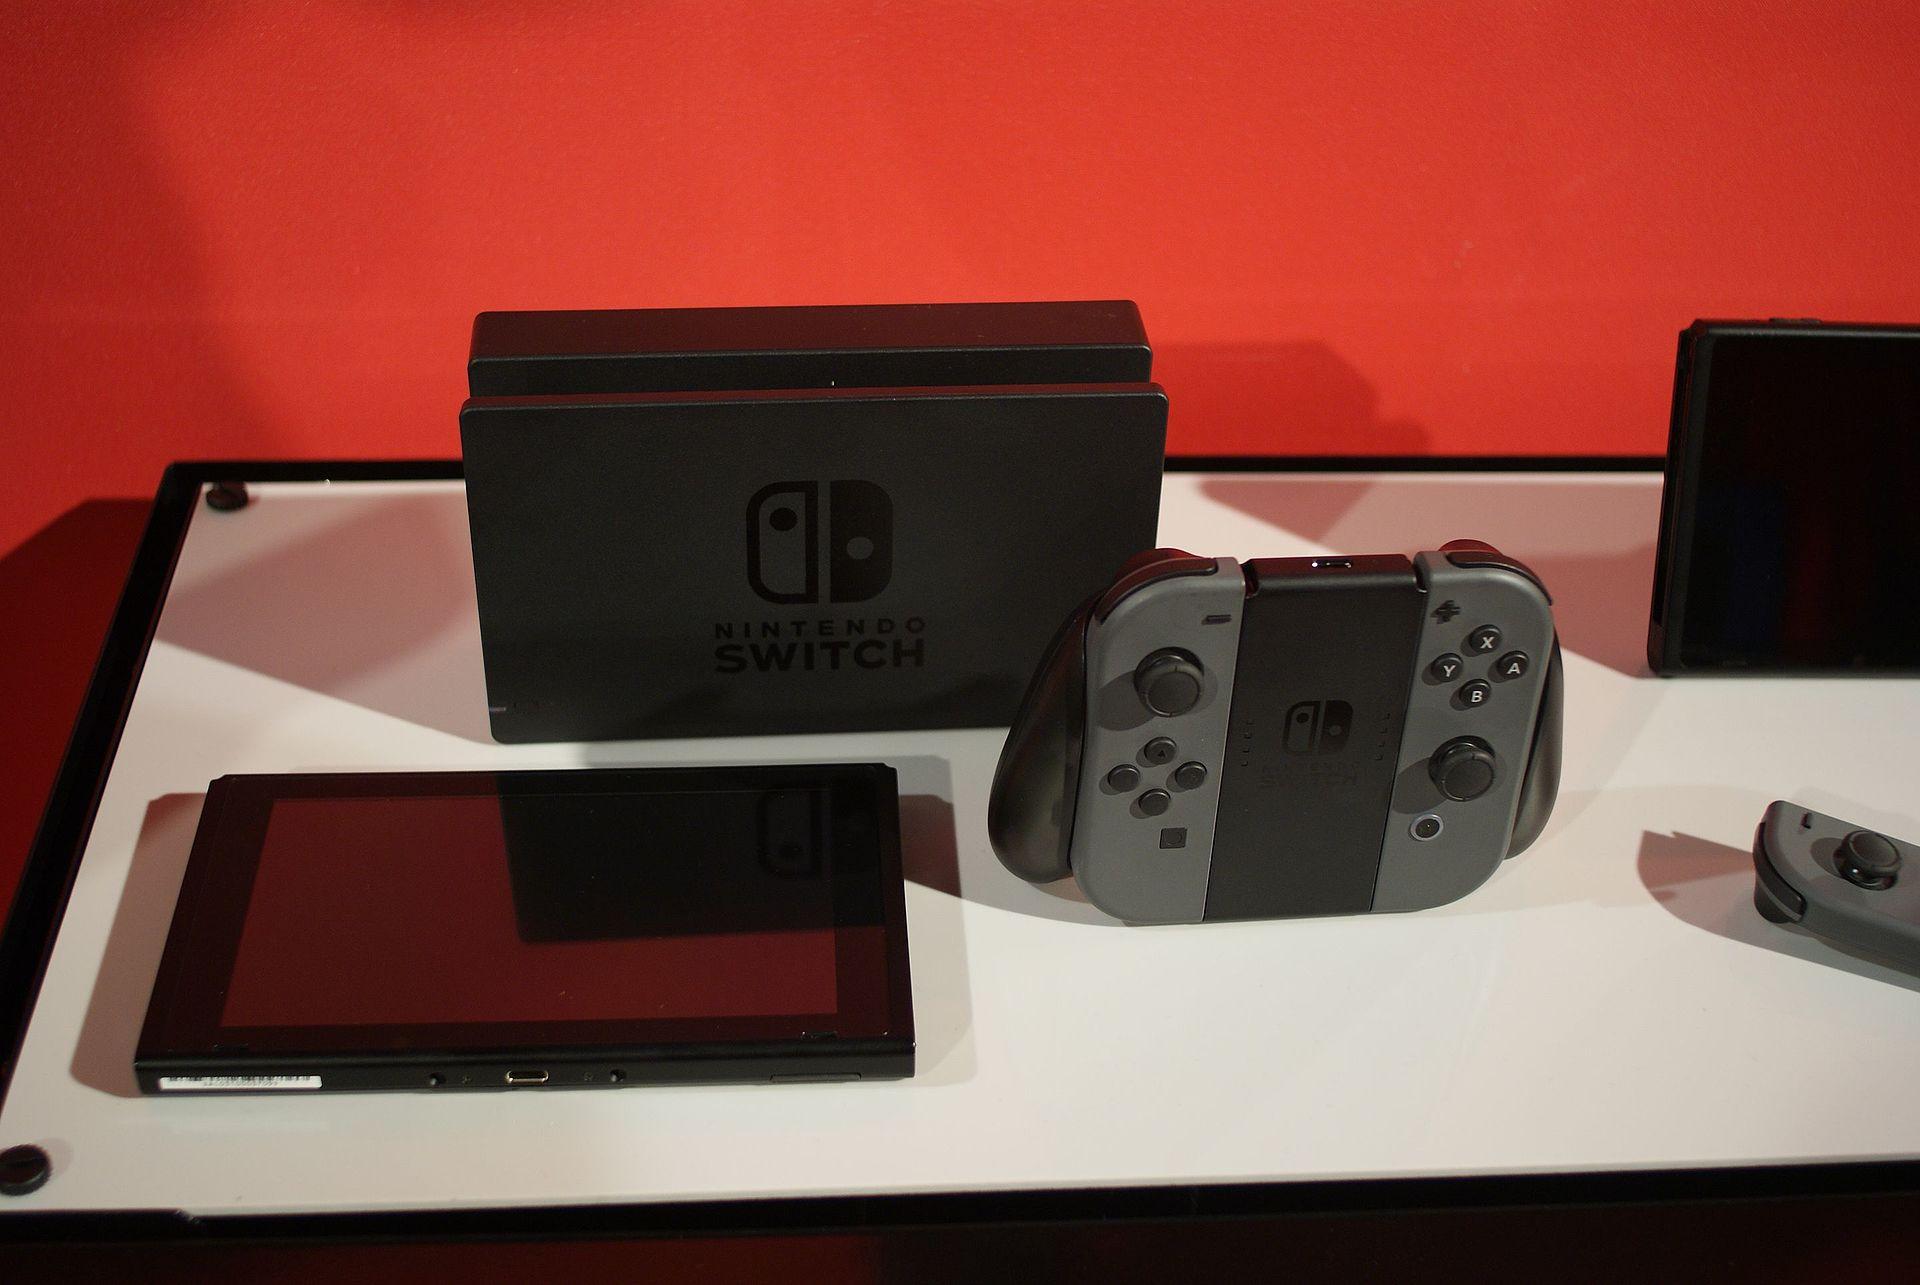 New Nintendo Switch Dock Design